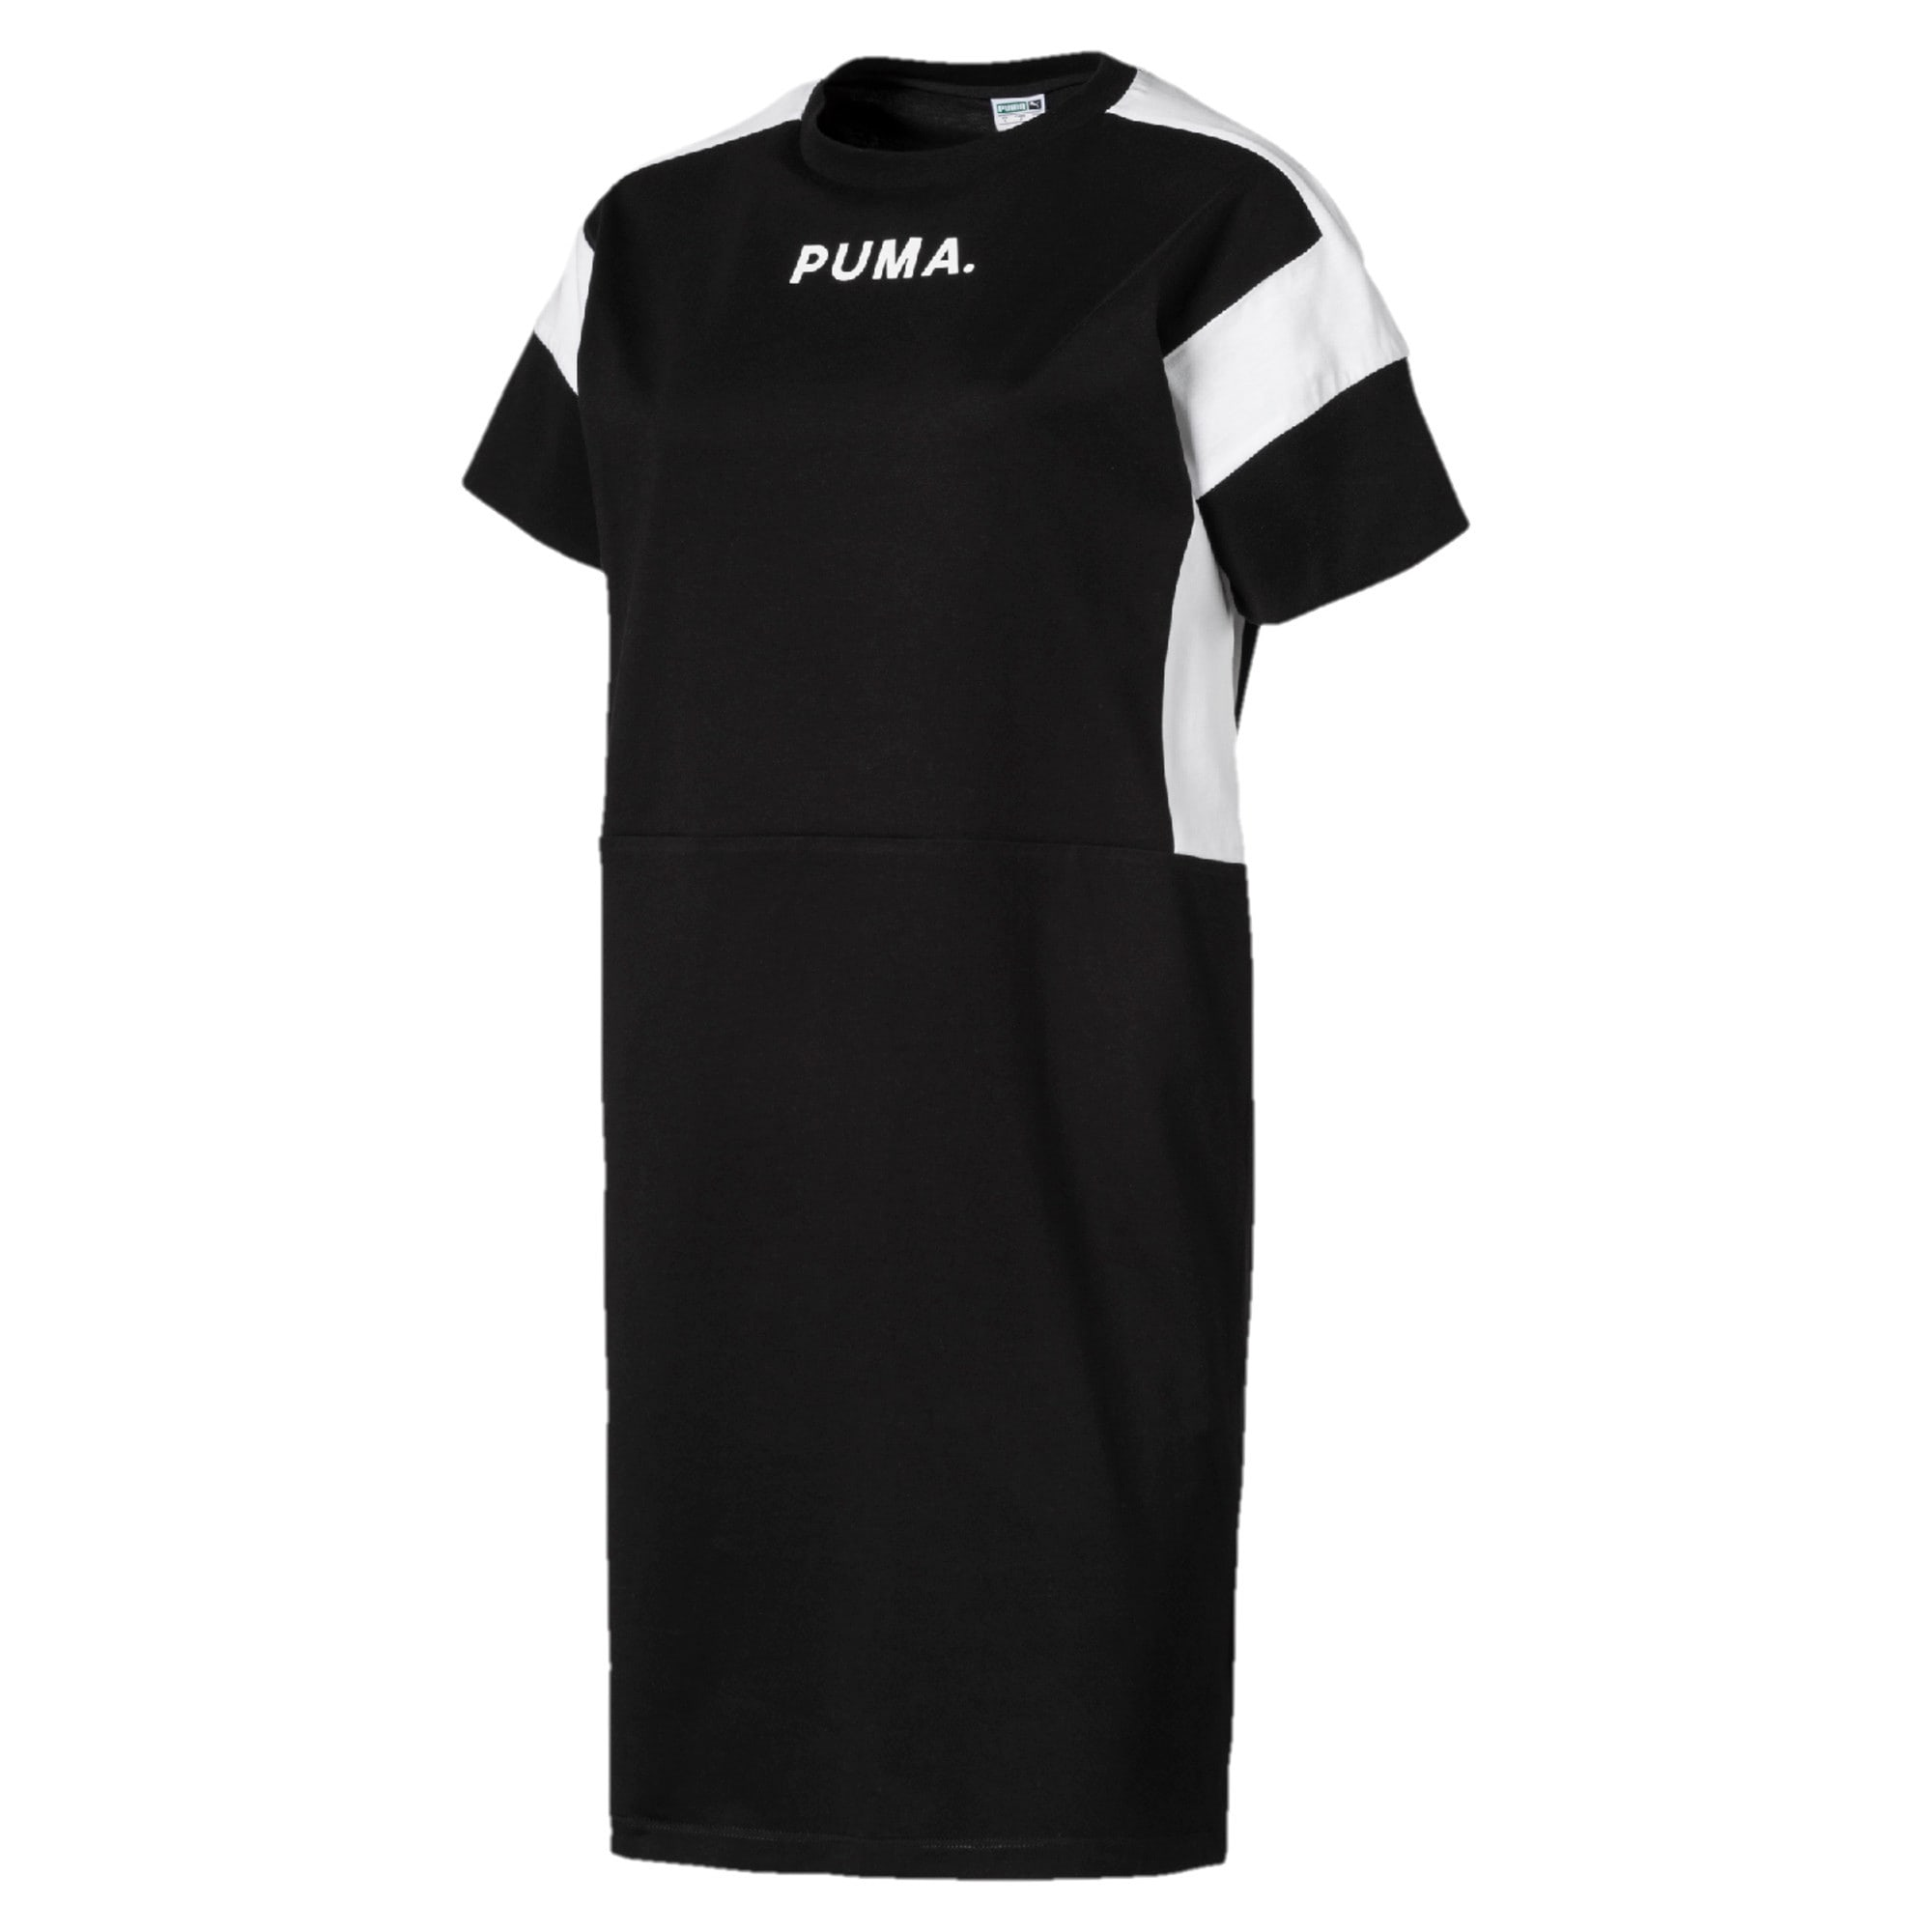 Thumbnail 1 of Chase Dress, Cotton Black, medium